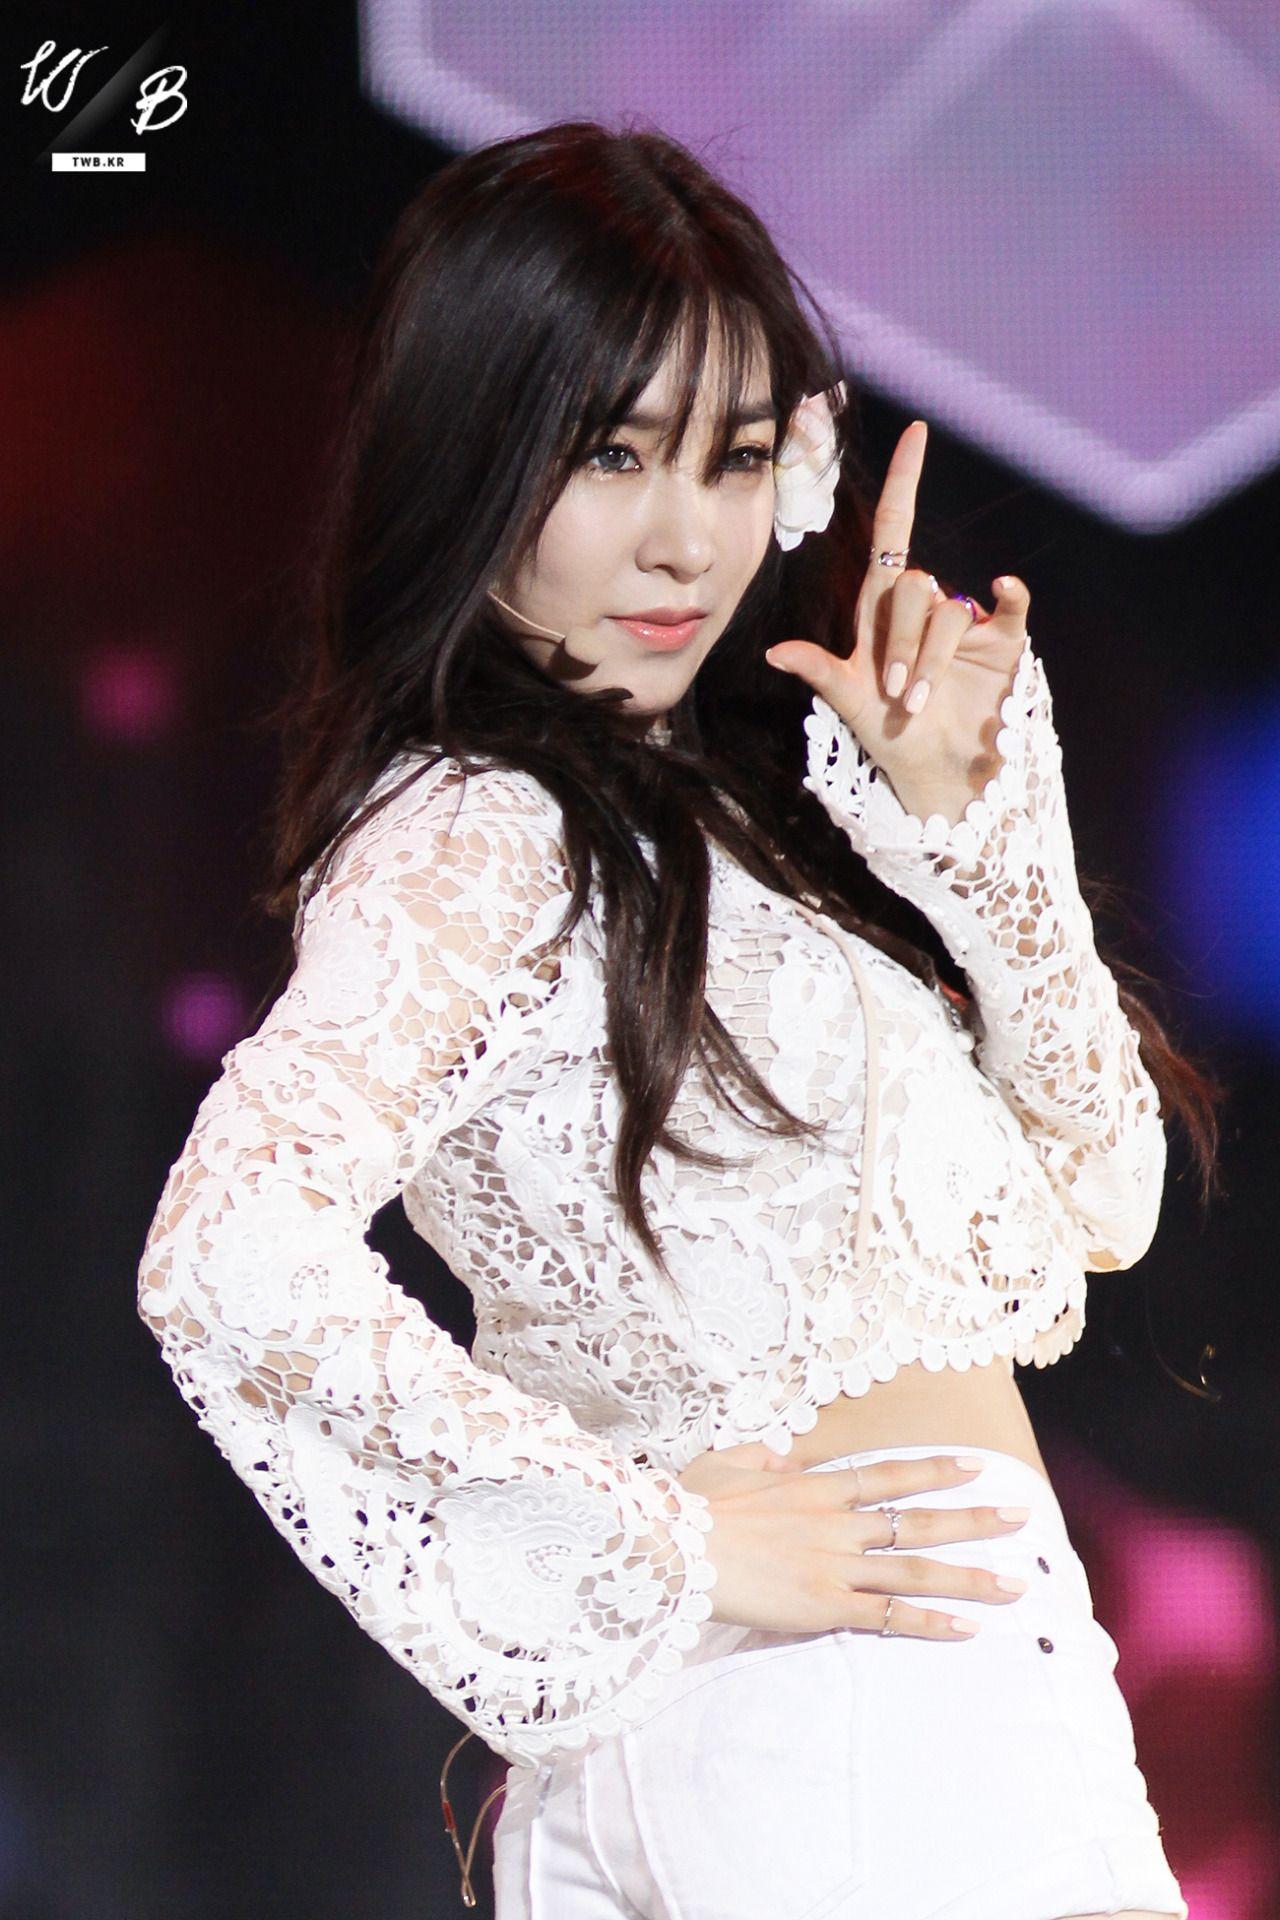 FY! GG | Girls generation, Snsd tiffany, Tiffany hwang